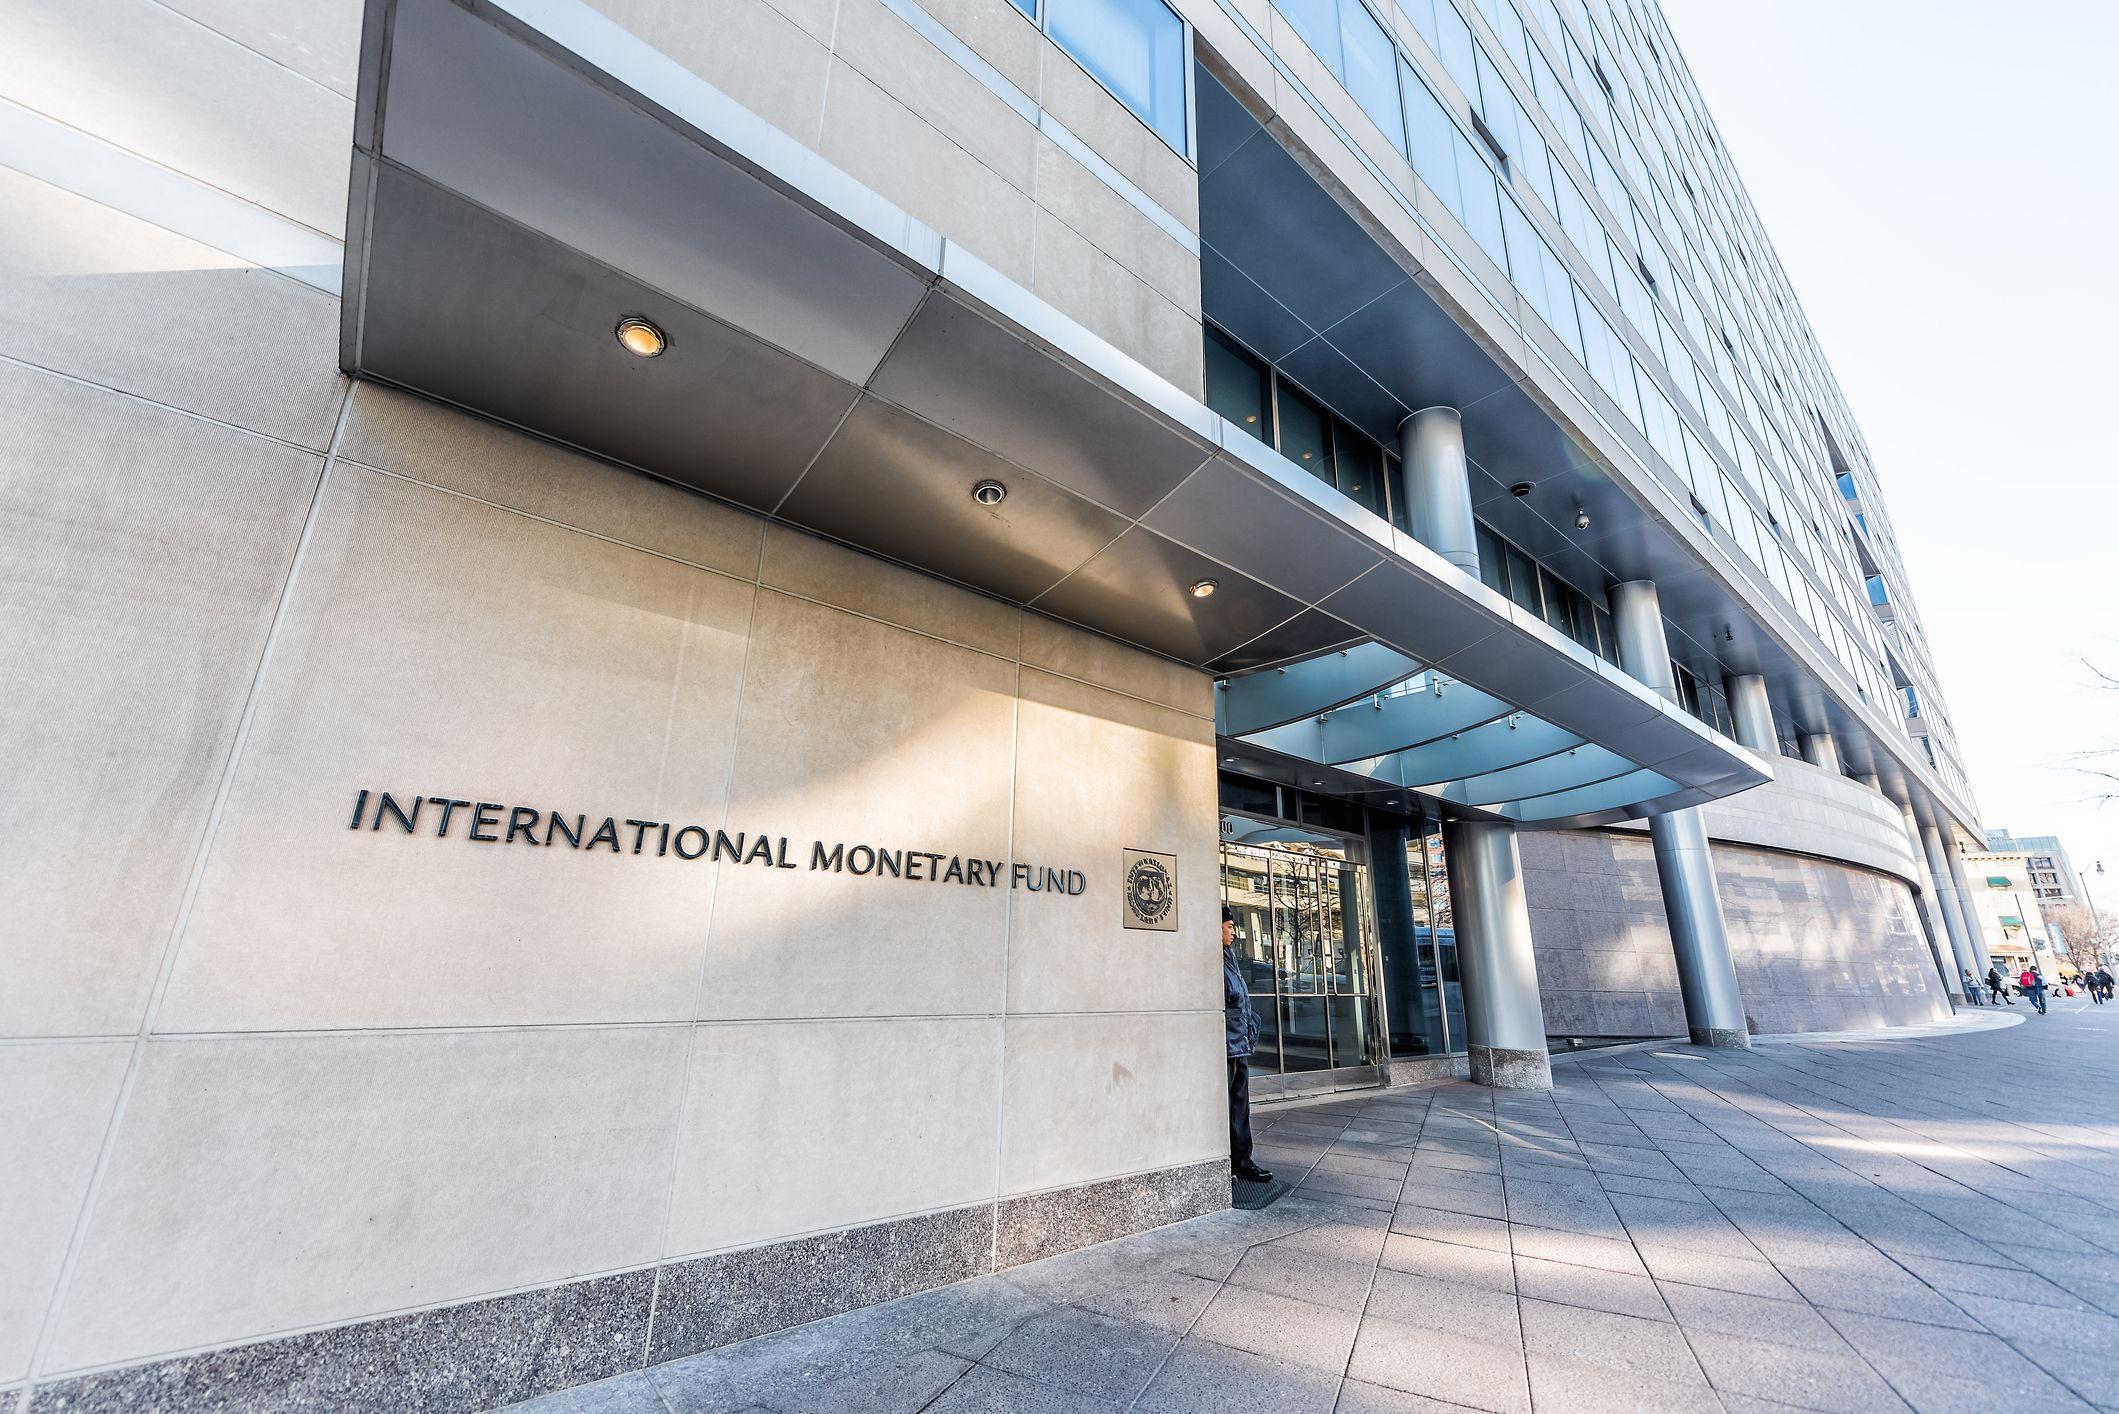 International Monetary Fund (IMF) Definition